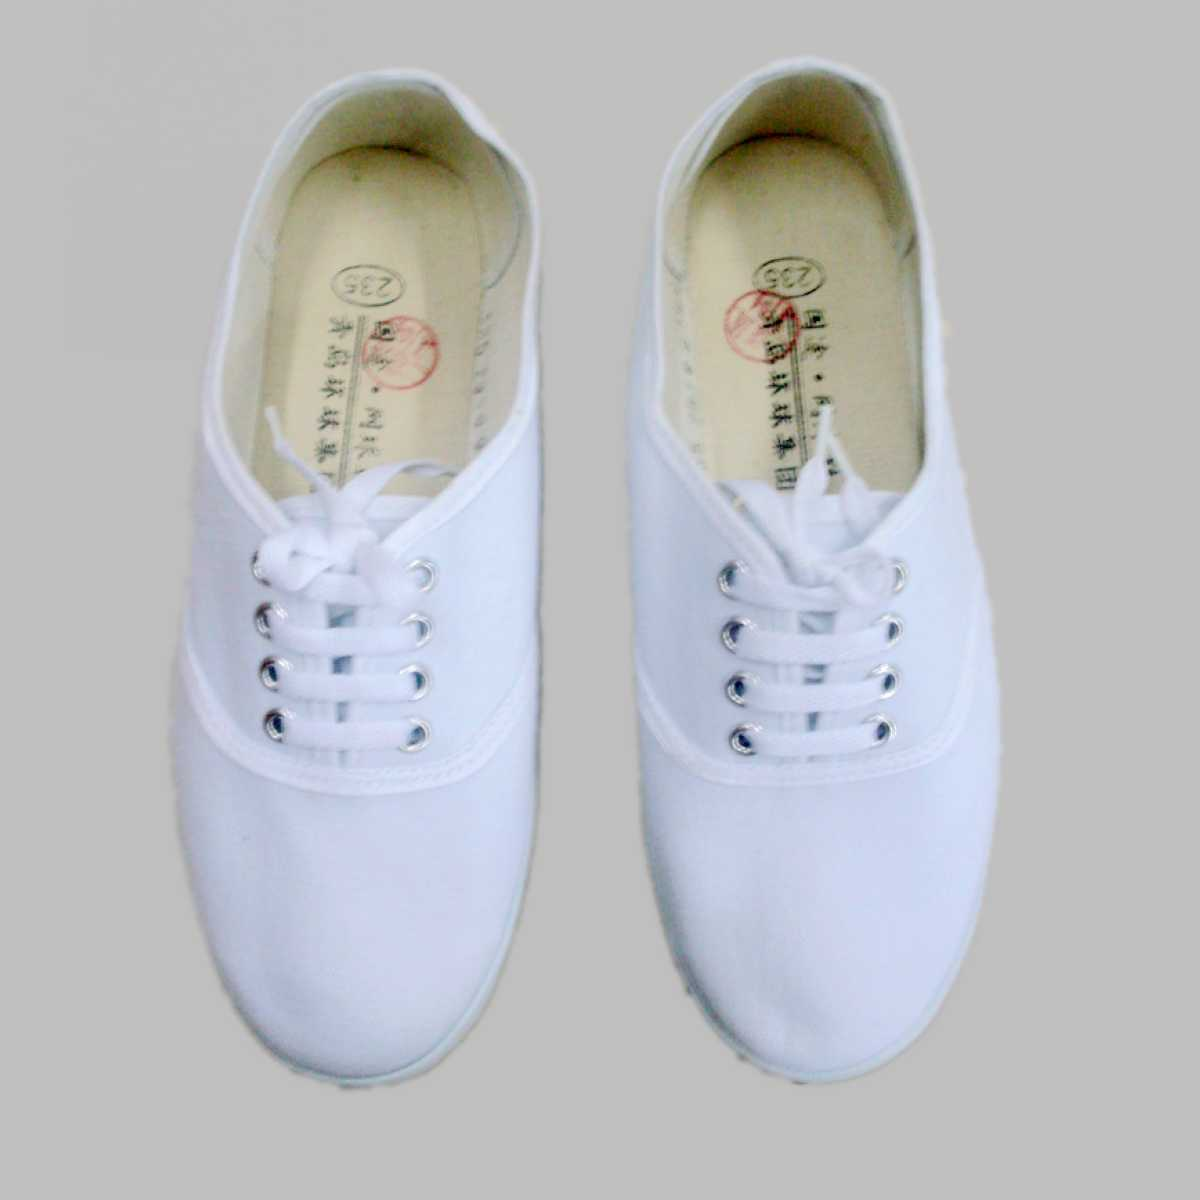 Спортивная обувь Qingdao Global Холщевка Мужские Нескользящая резина